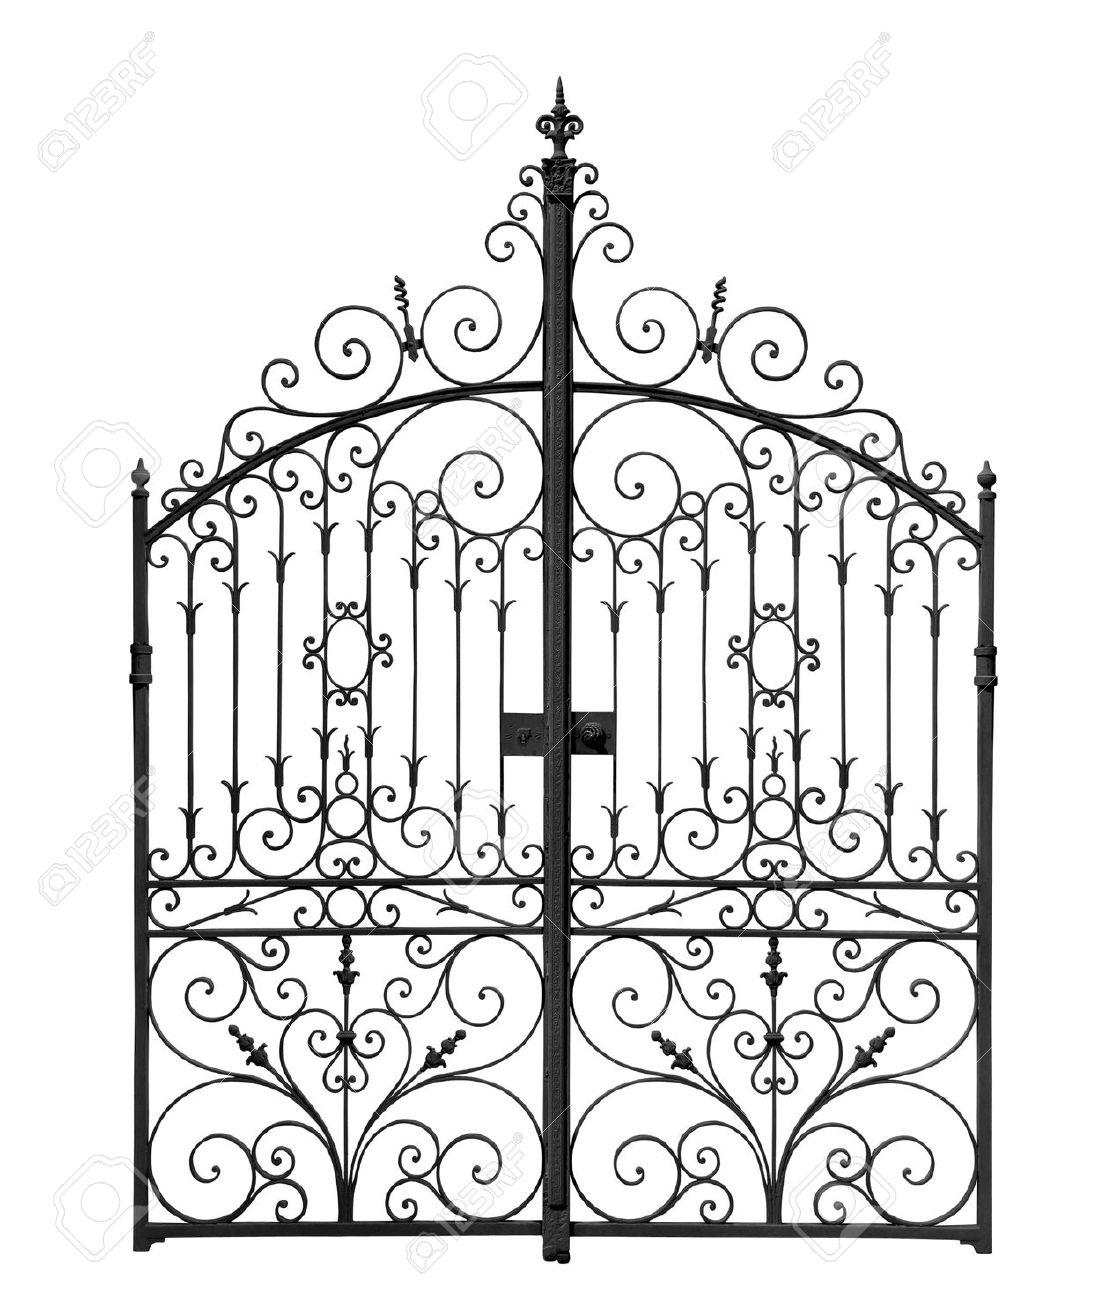 Gate clipart graveyard Gate clipart Cemetery Clipground gate